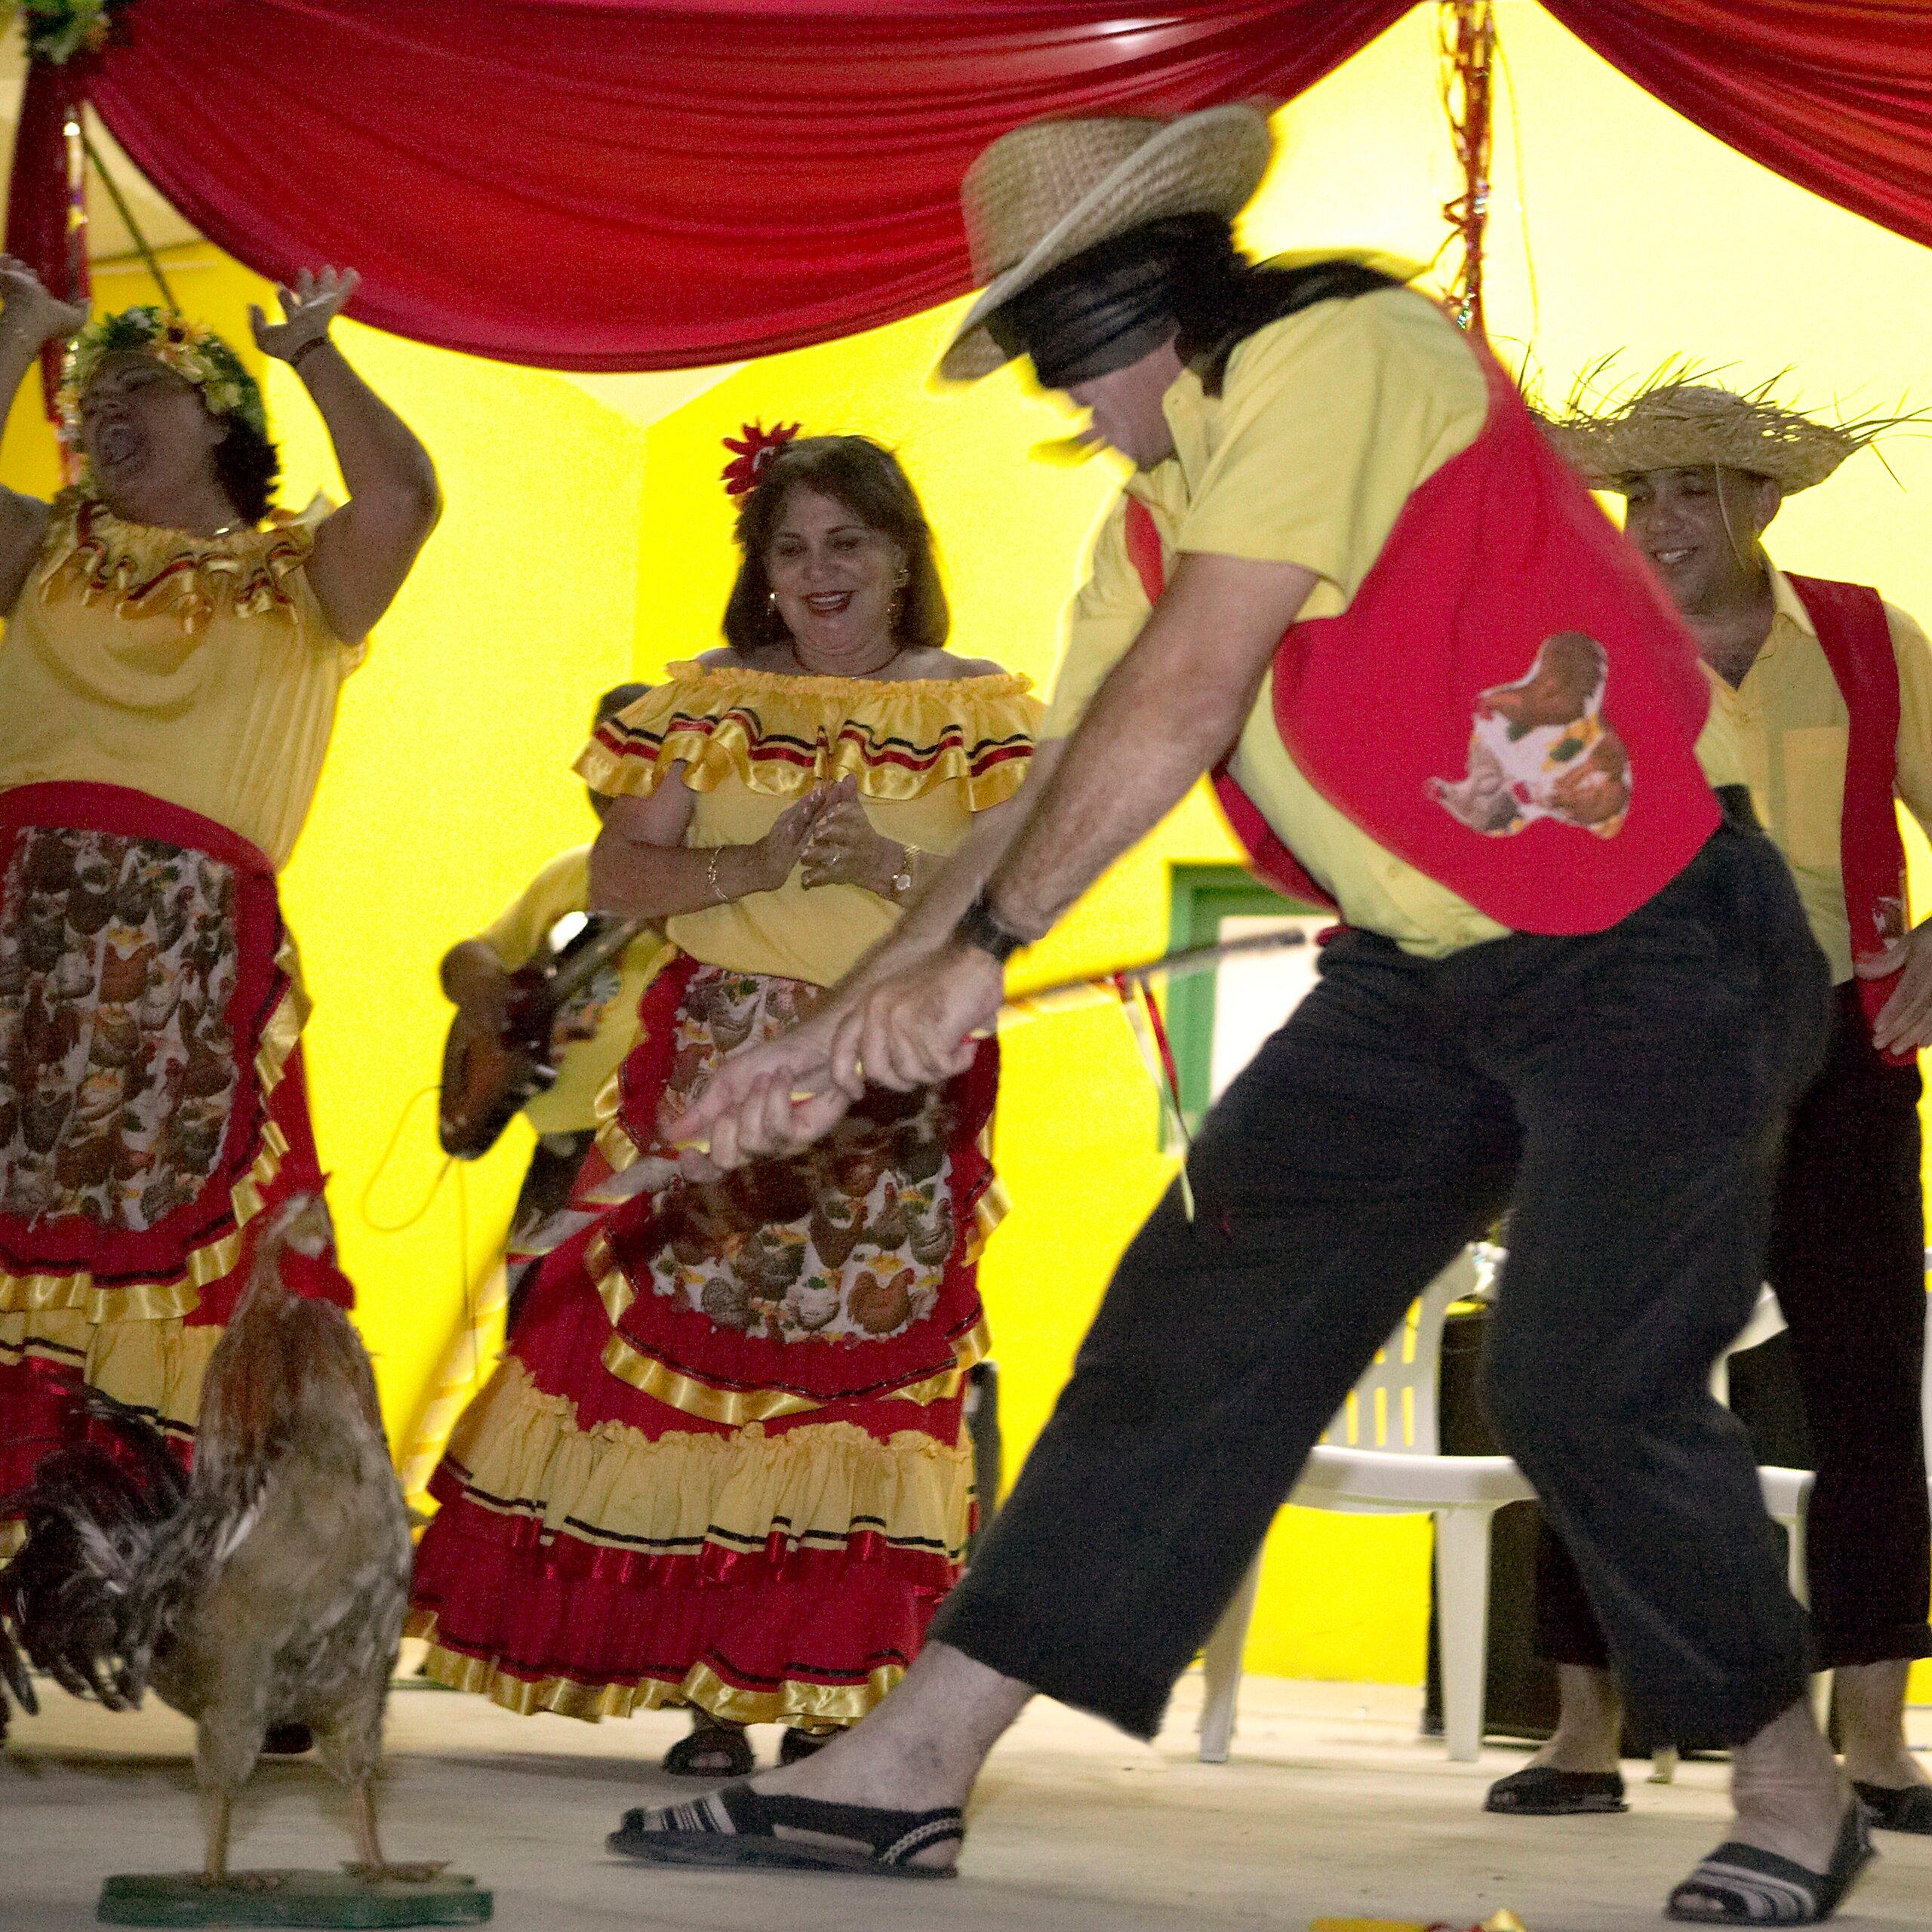 2019 Dera Gai (St. John's Day) In Aruba